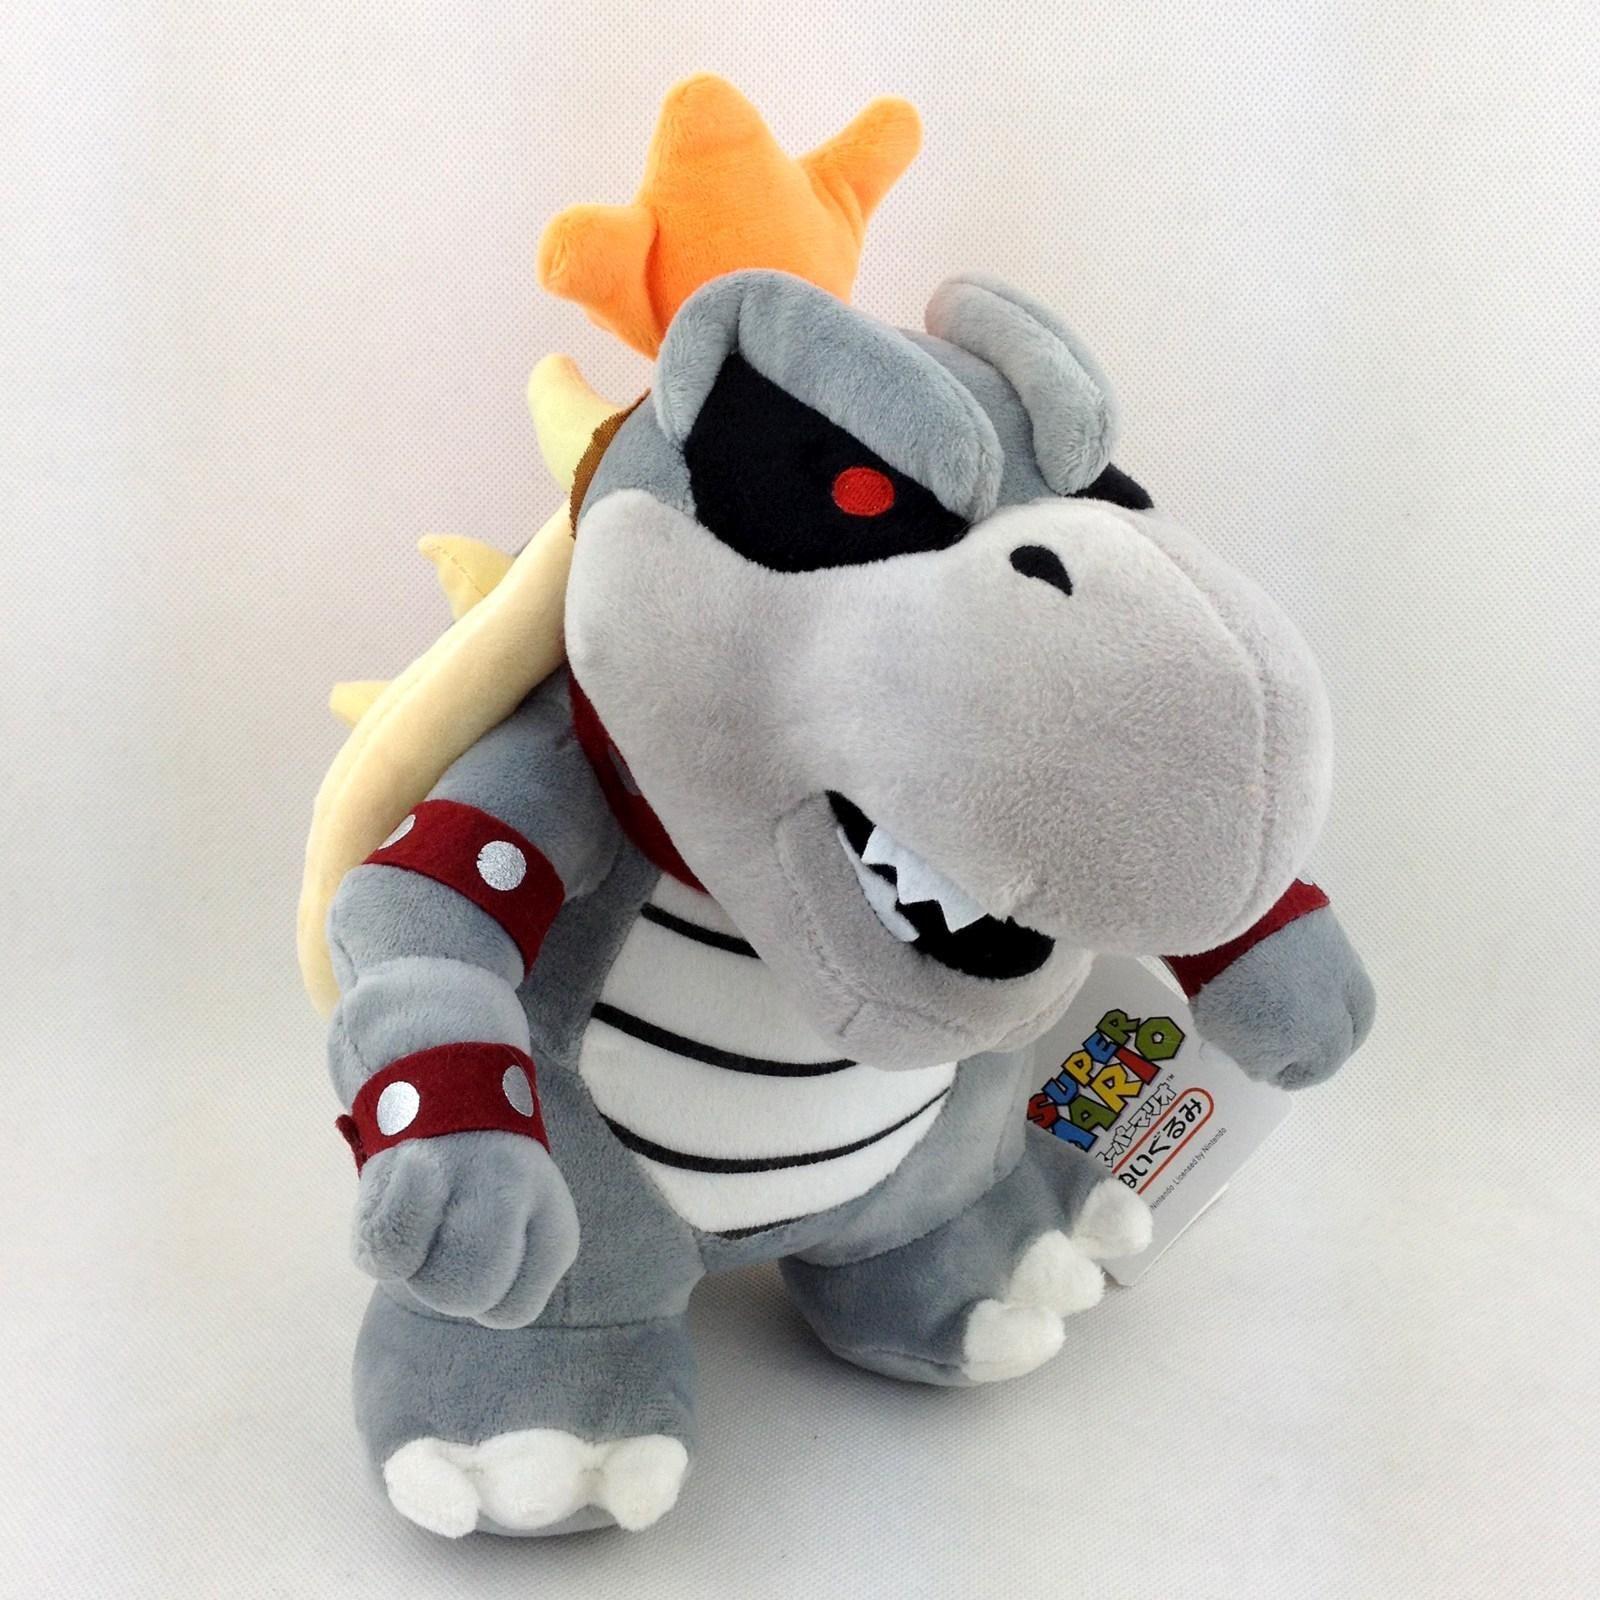 Dry Bowser Super Mario Bros Bones Koopa Troopa Soft Plush